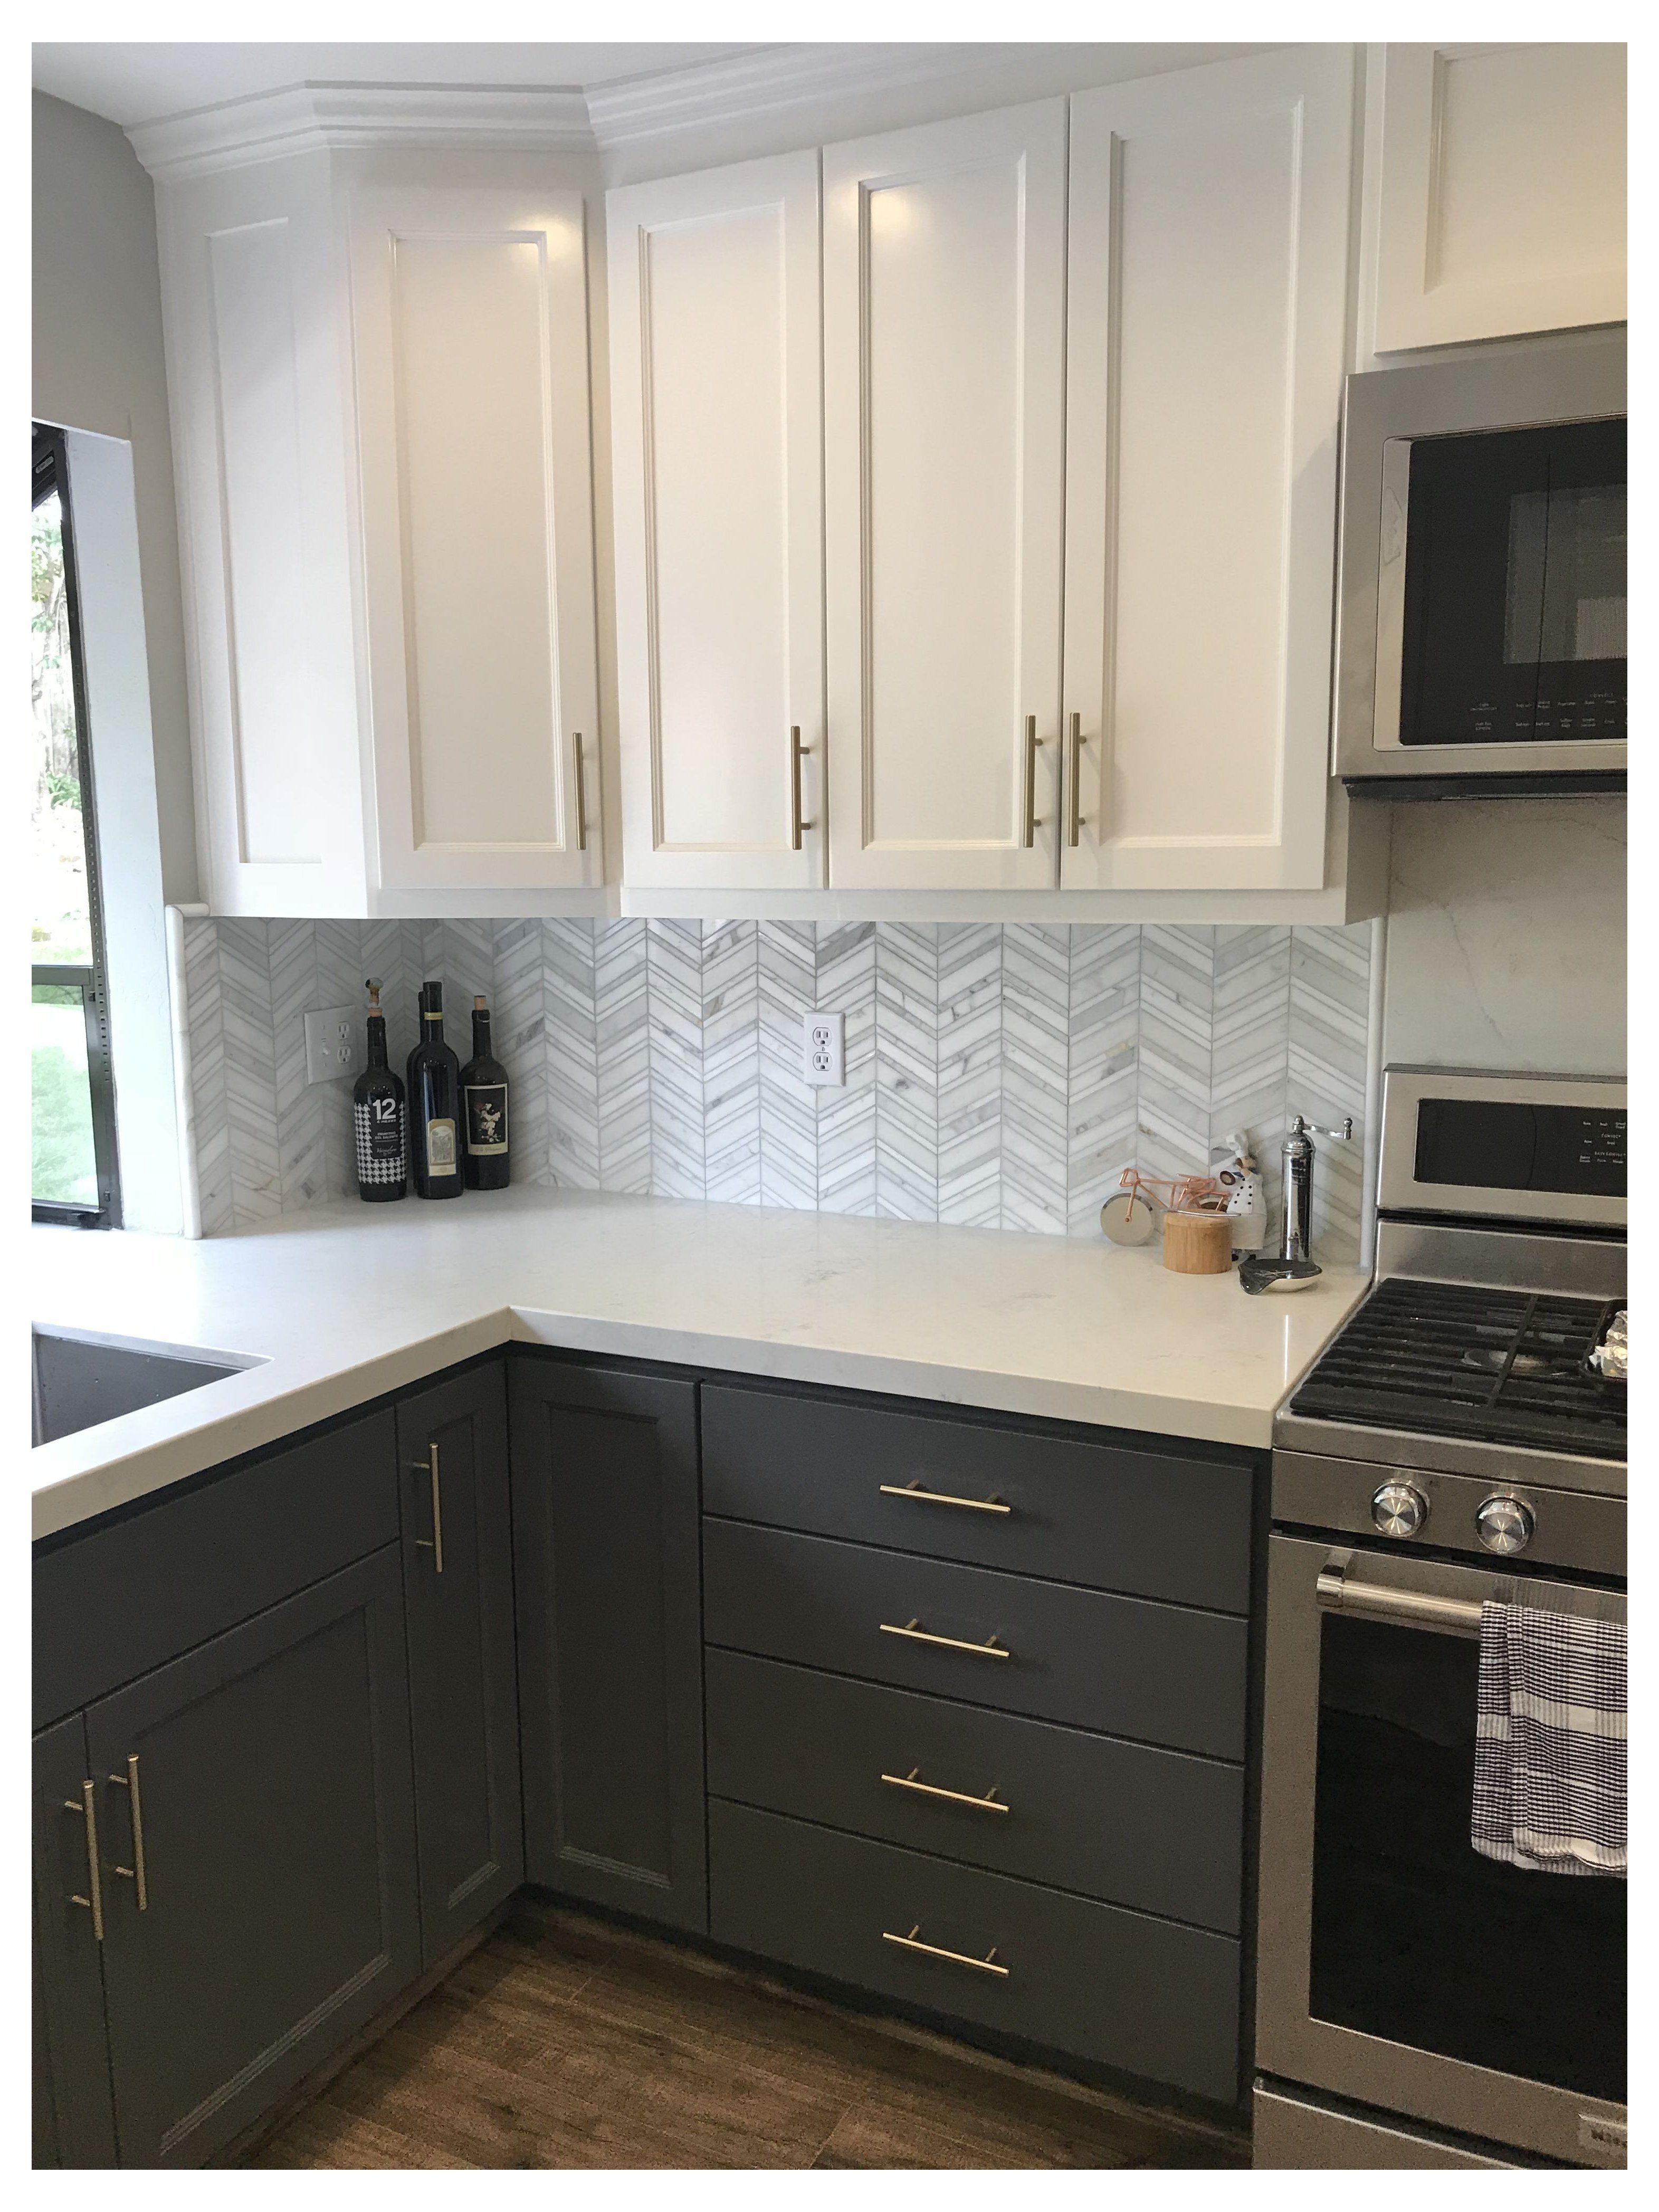 10 Beautiful Rustic Kitchen Remodel Shabby Chic Ideas Kitchen Ideas On A In 2020 Kitchen Cabinets With Black Appliances Kitchen Design Trendy Kitchen Backsplash